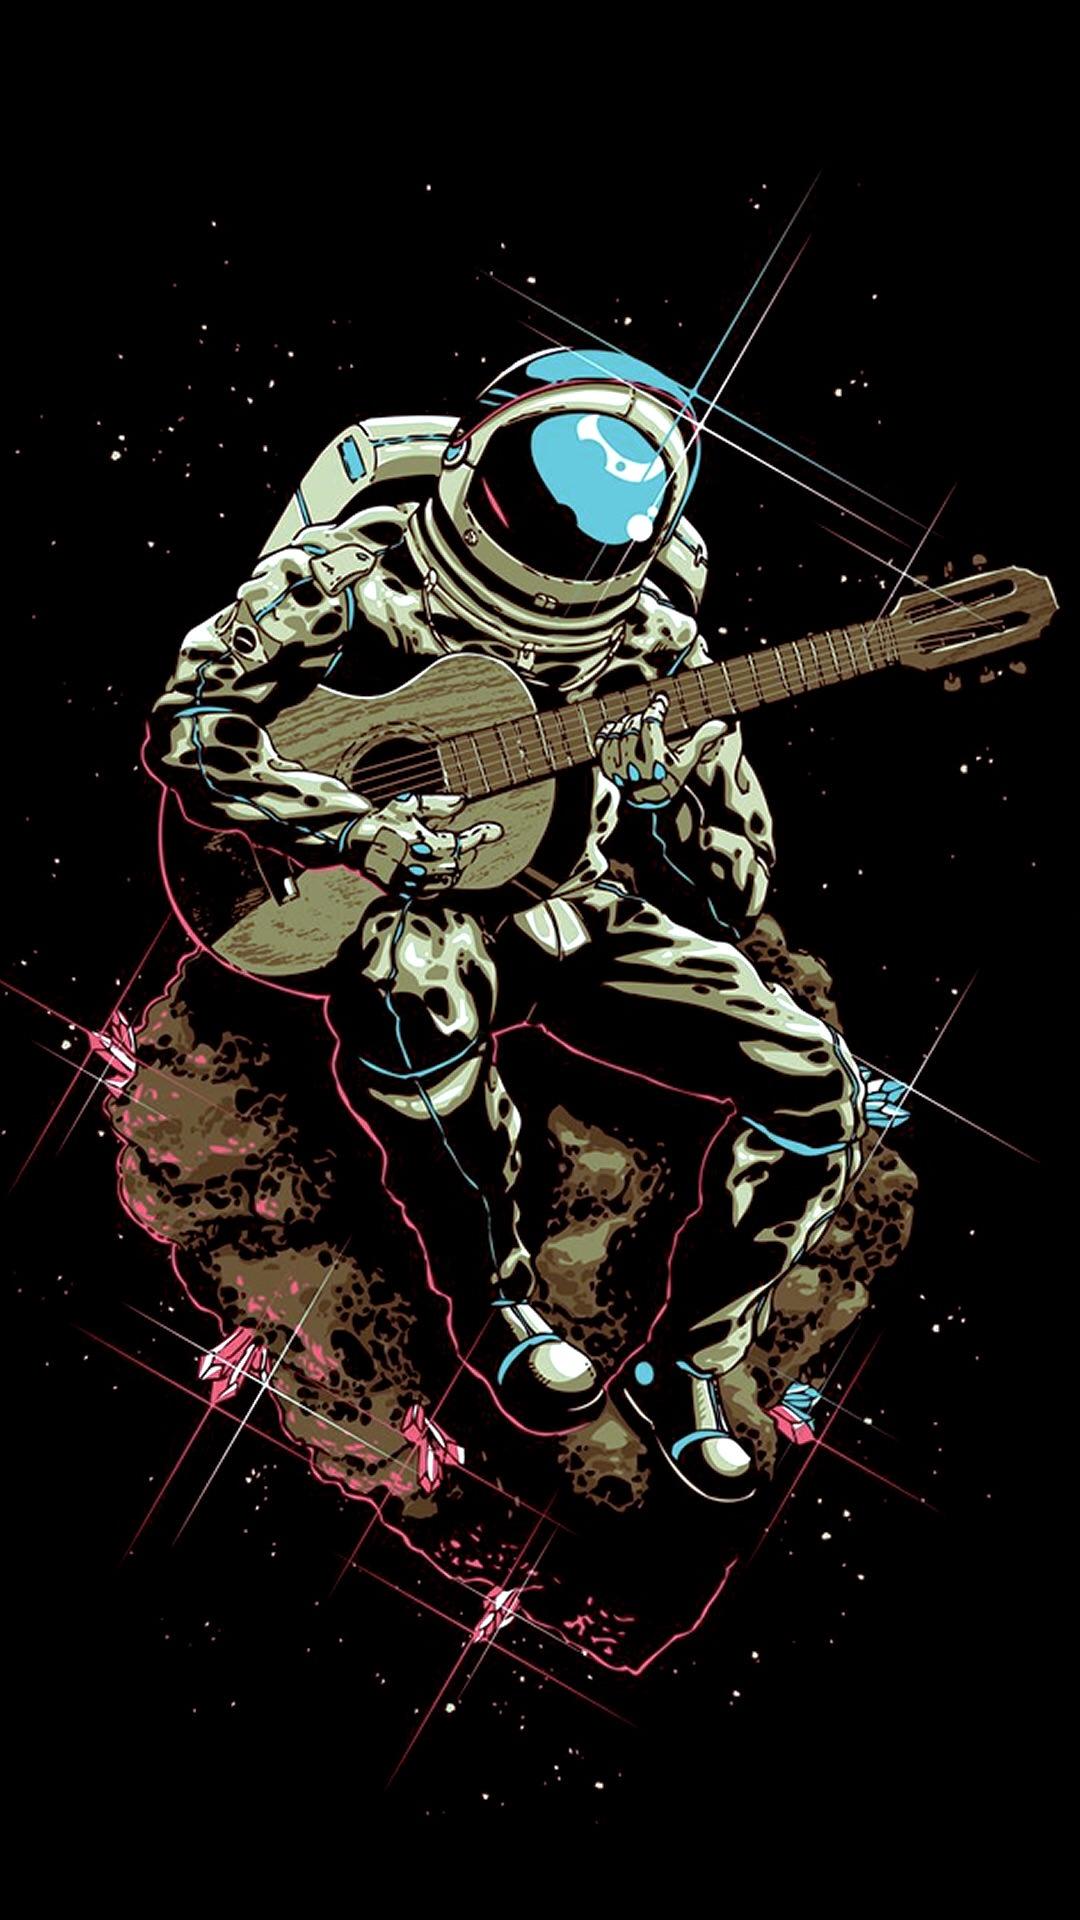 Psychedelic Astronaut wwwpixsharkcom   Images 1080x1920